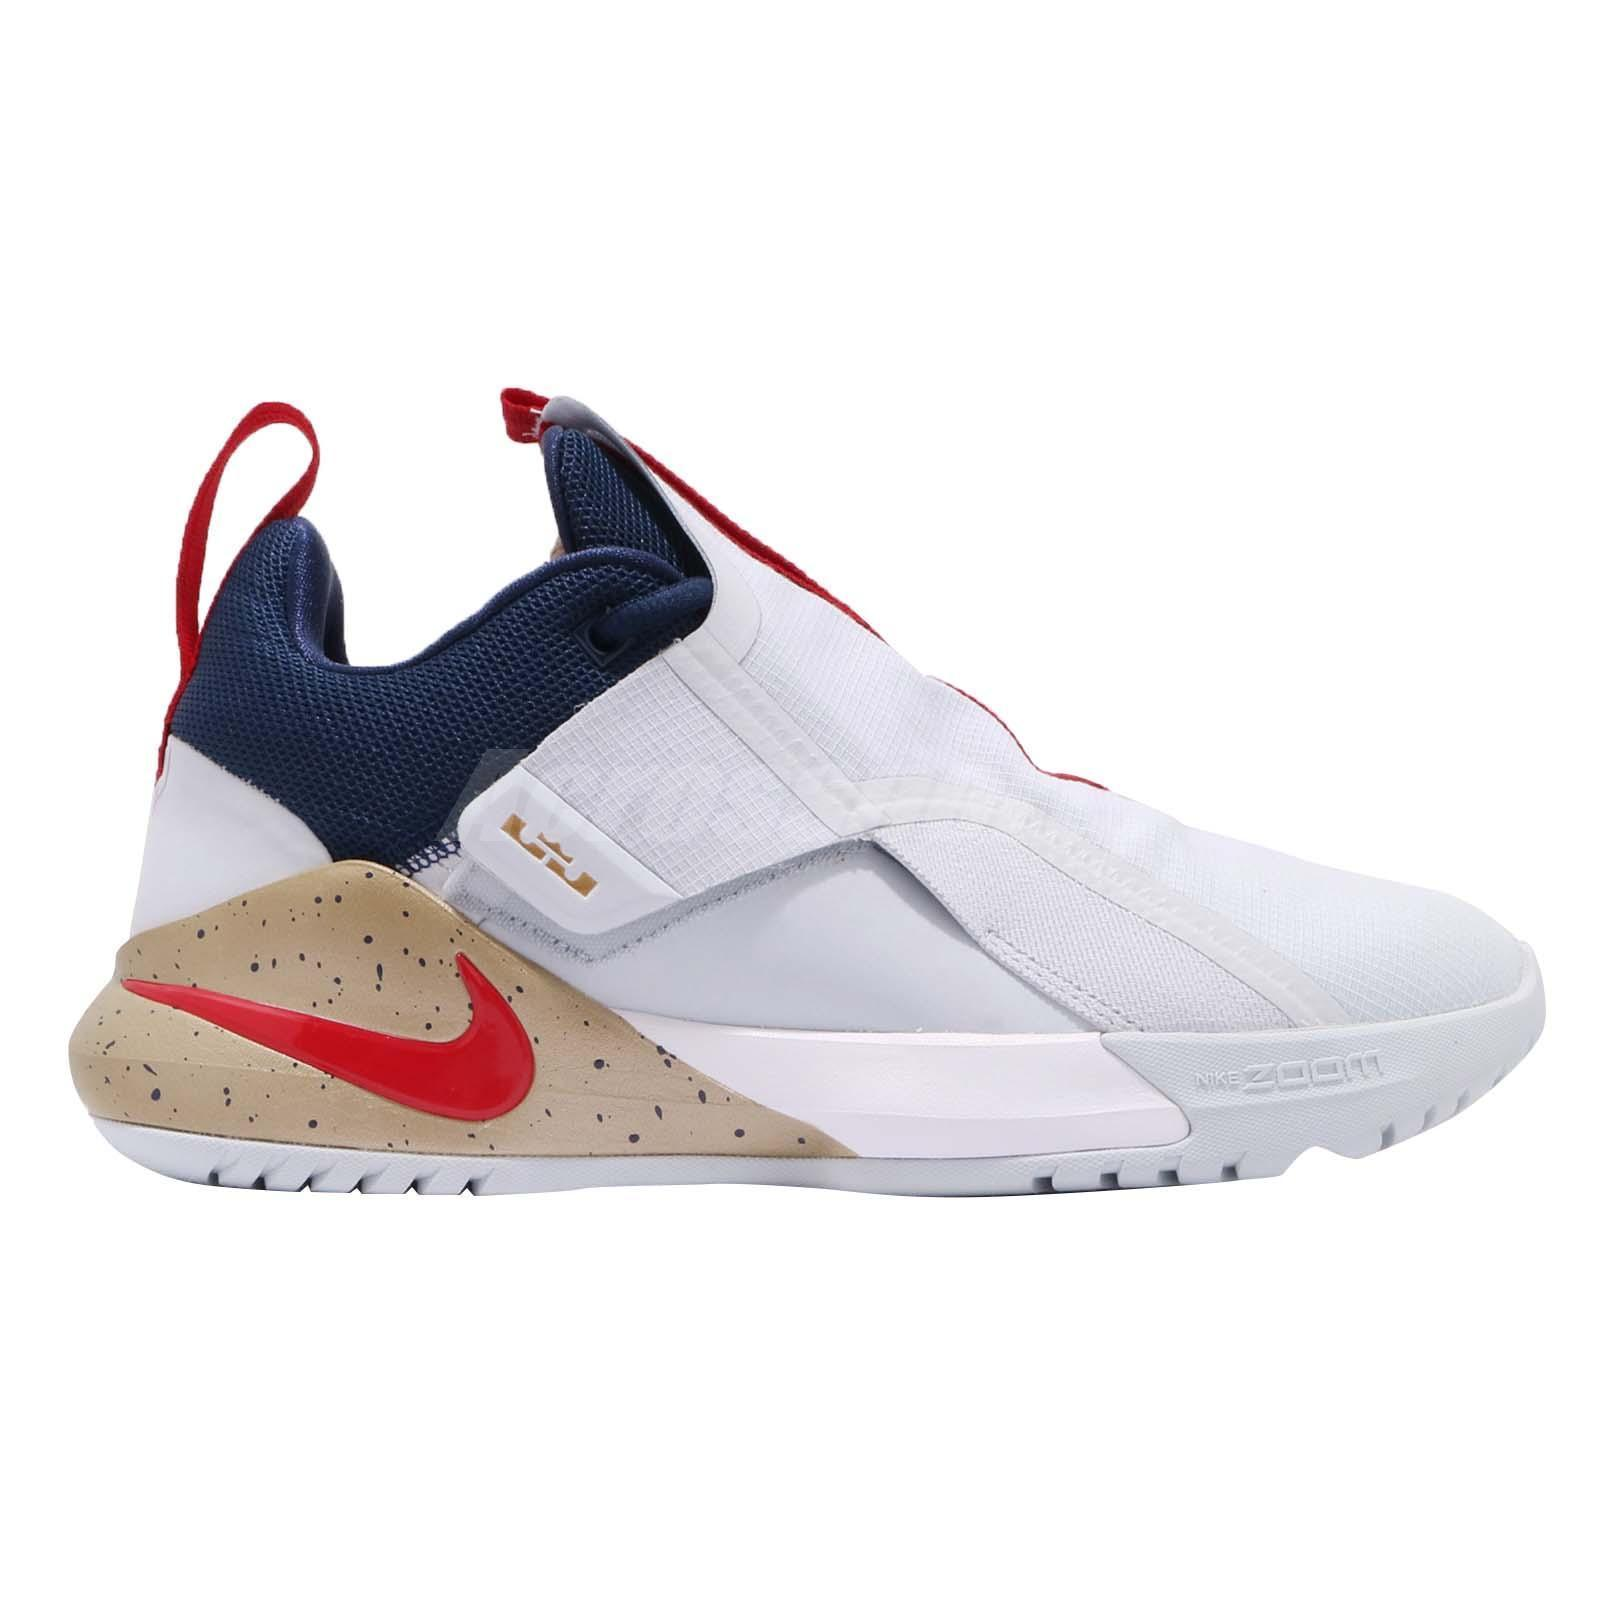 Nike LeBron Ambassador 11